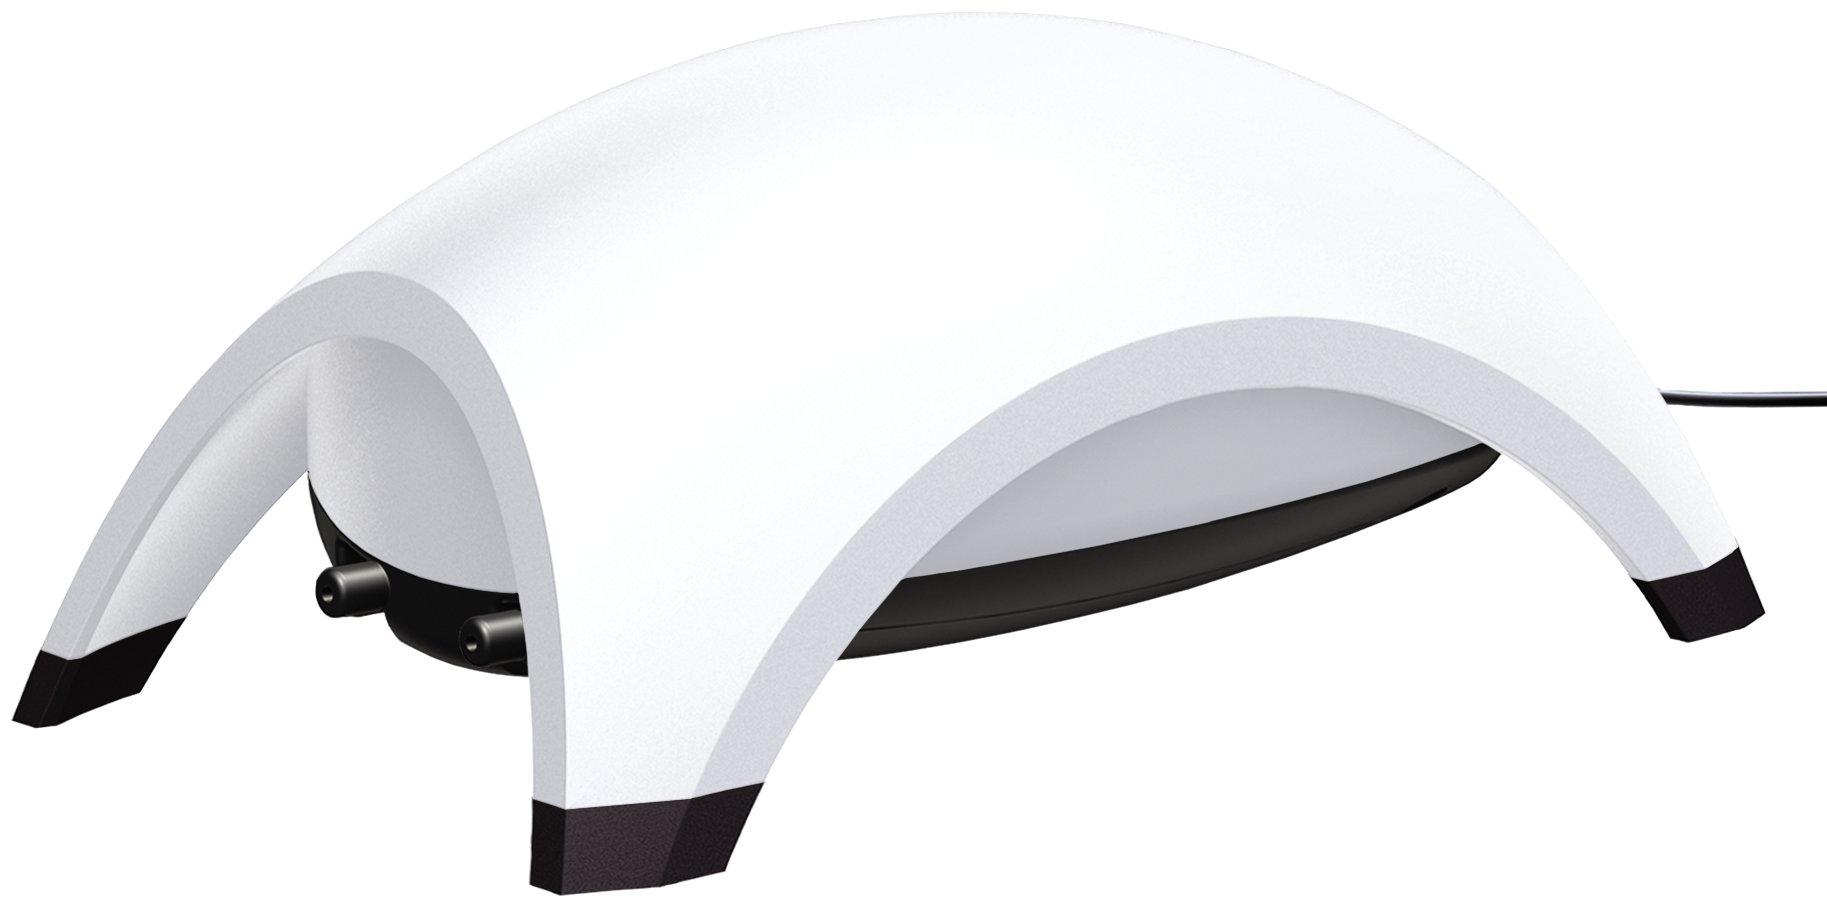 Preise TetraTec APS 300